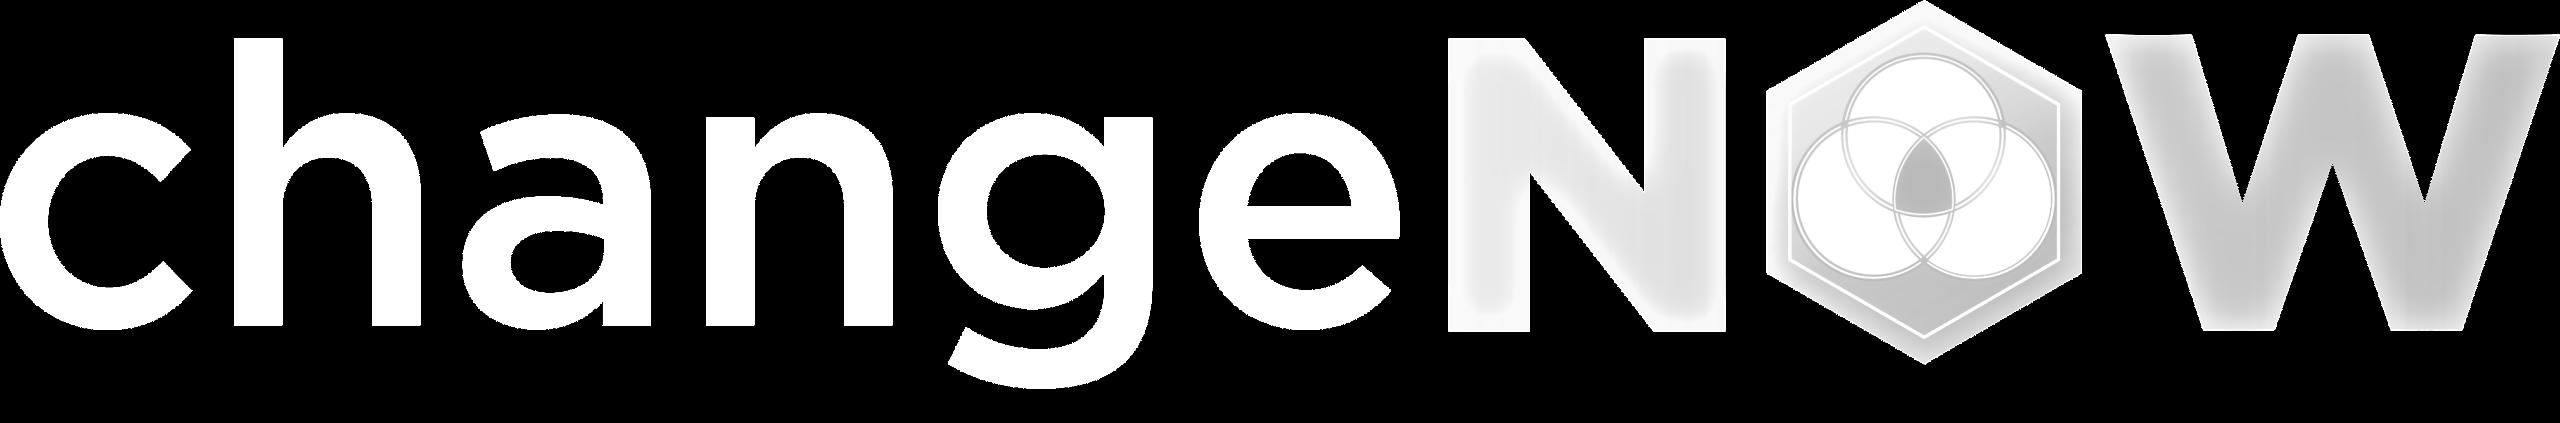 logo changenow